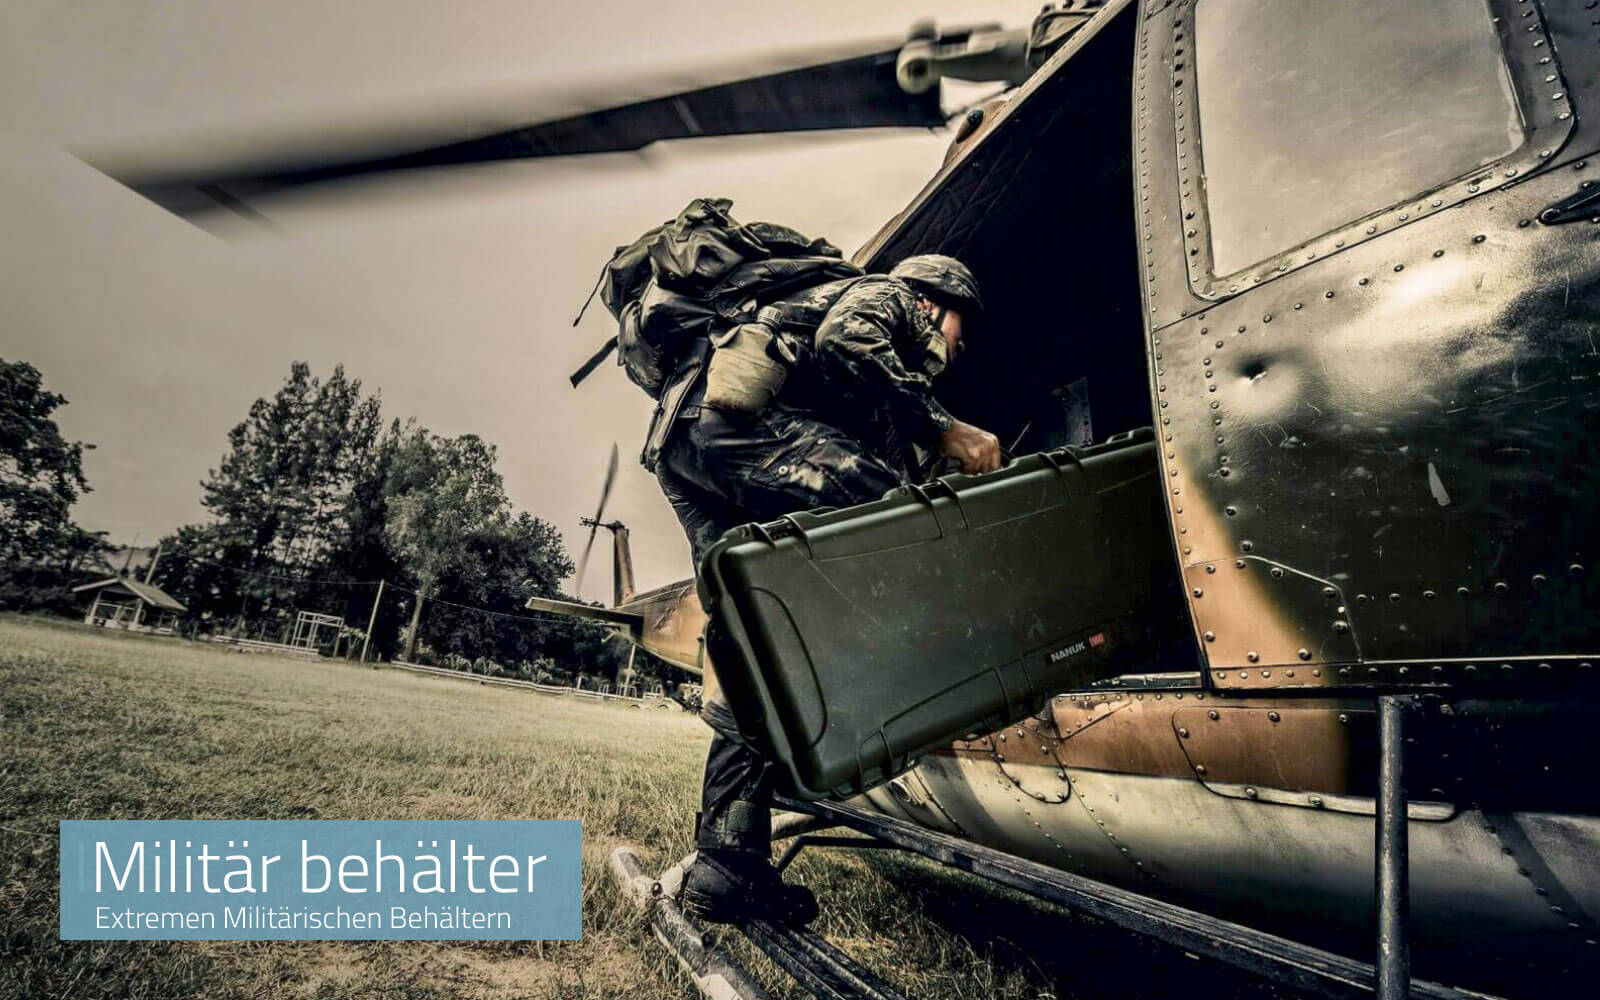 Militärbehälter